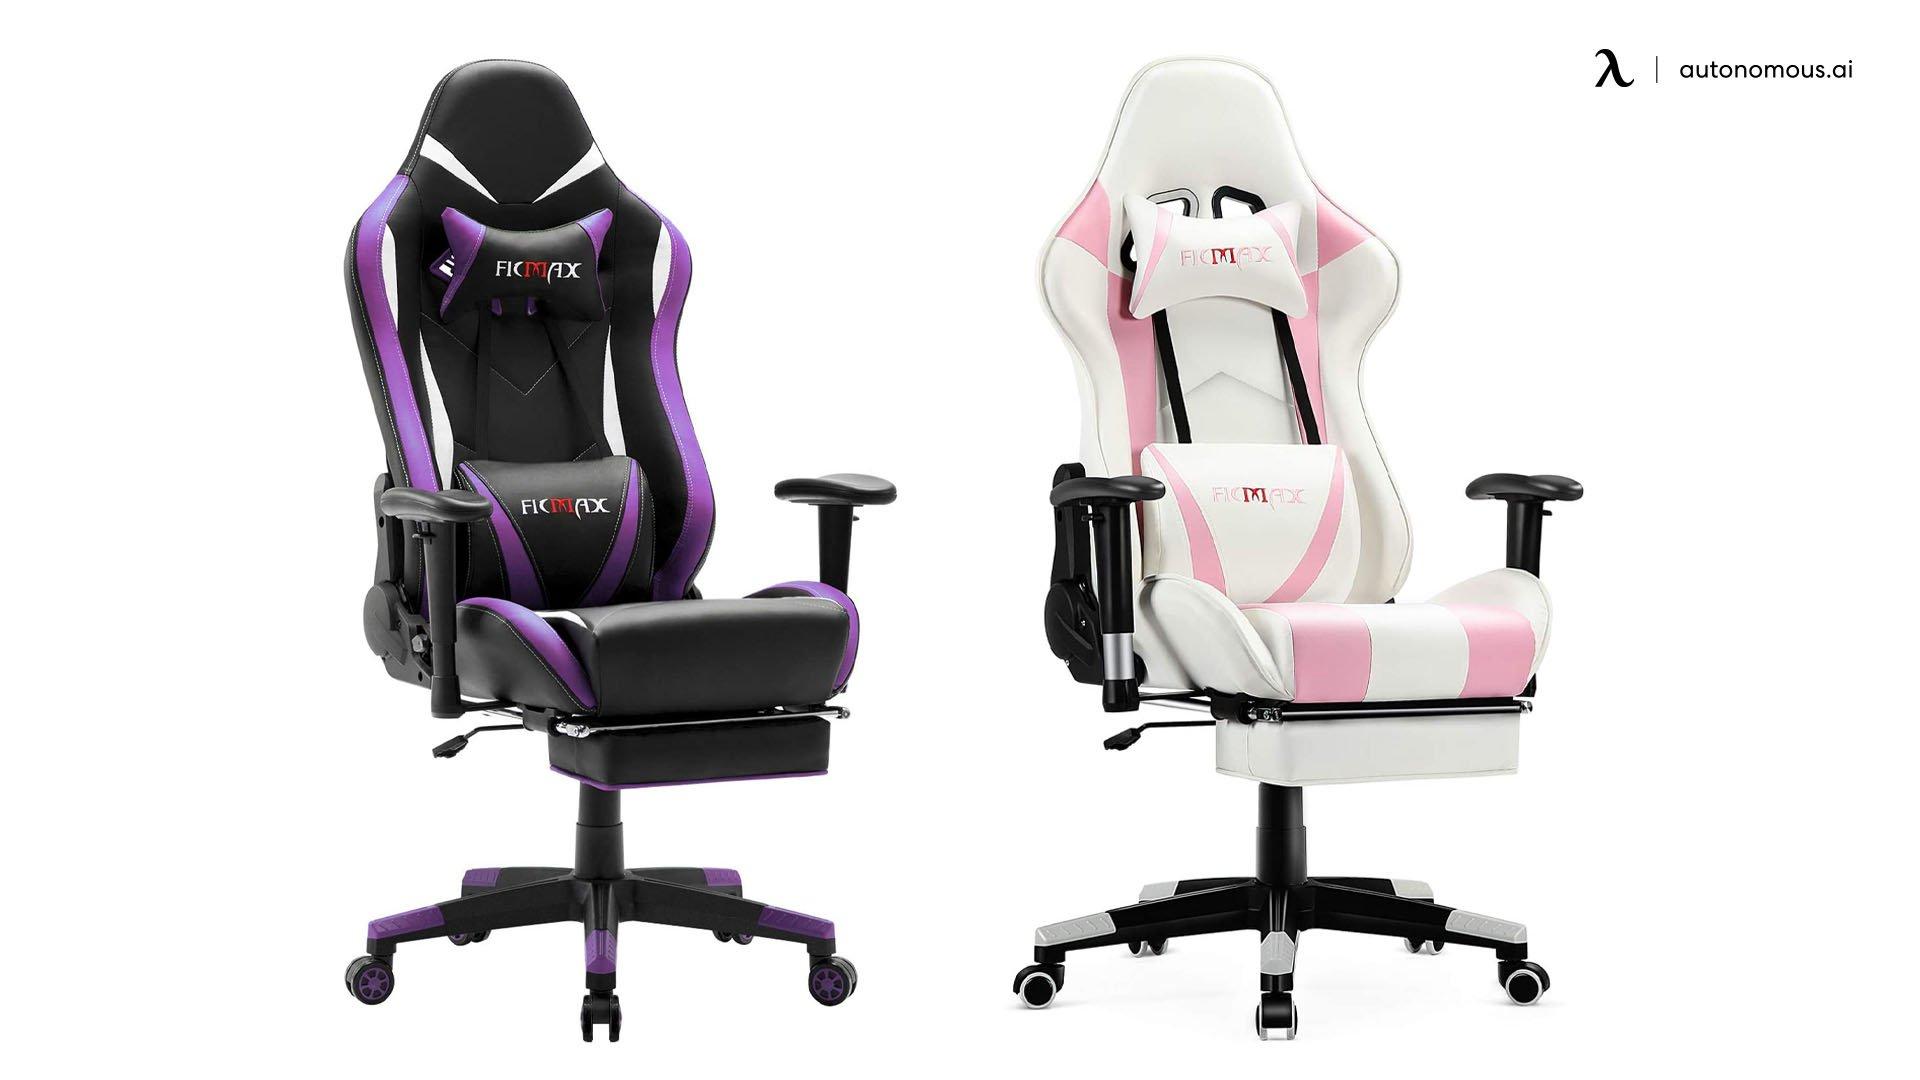 Ficmax Ergonomic Gaming Chair